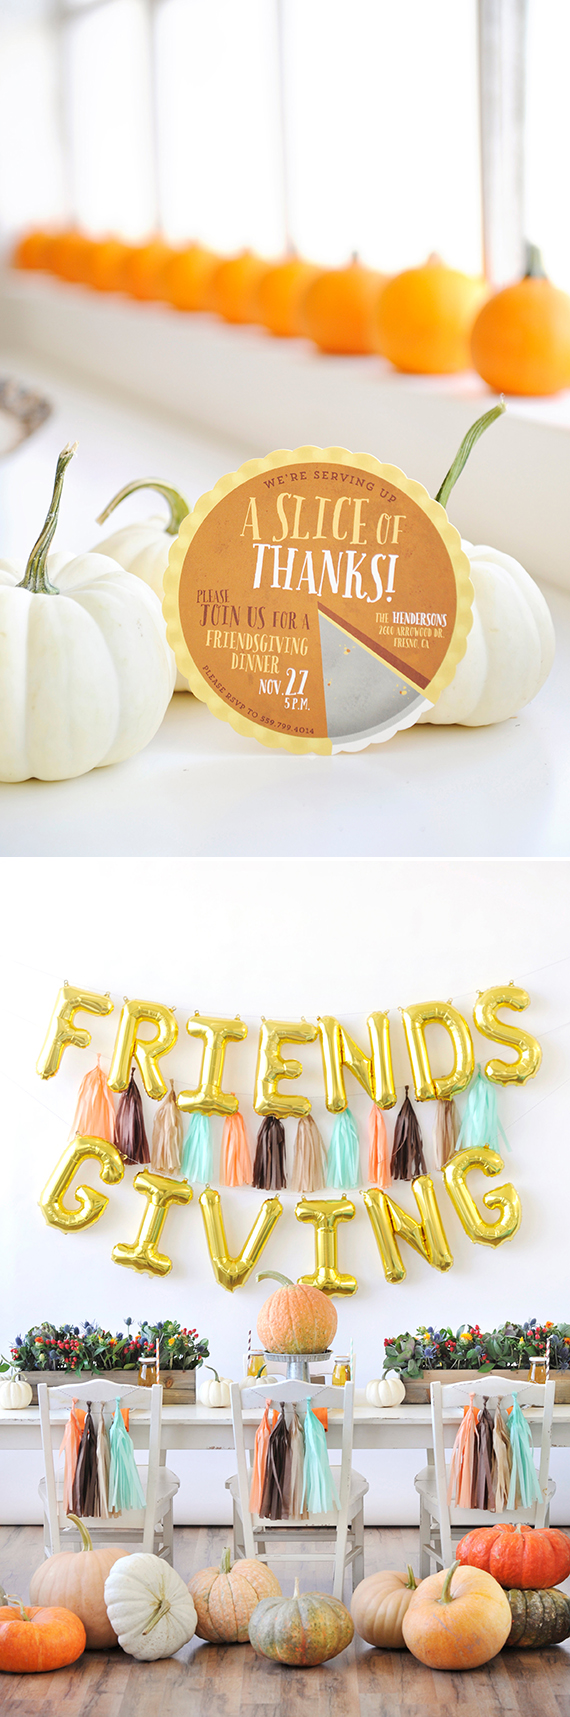 Friendsgiving Party Ideas